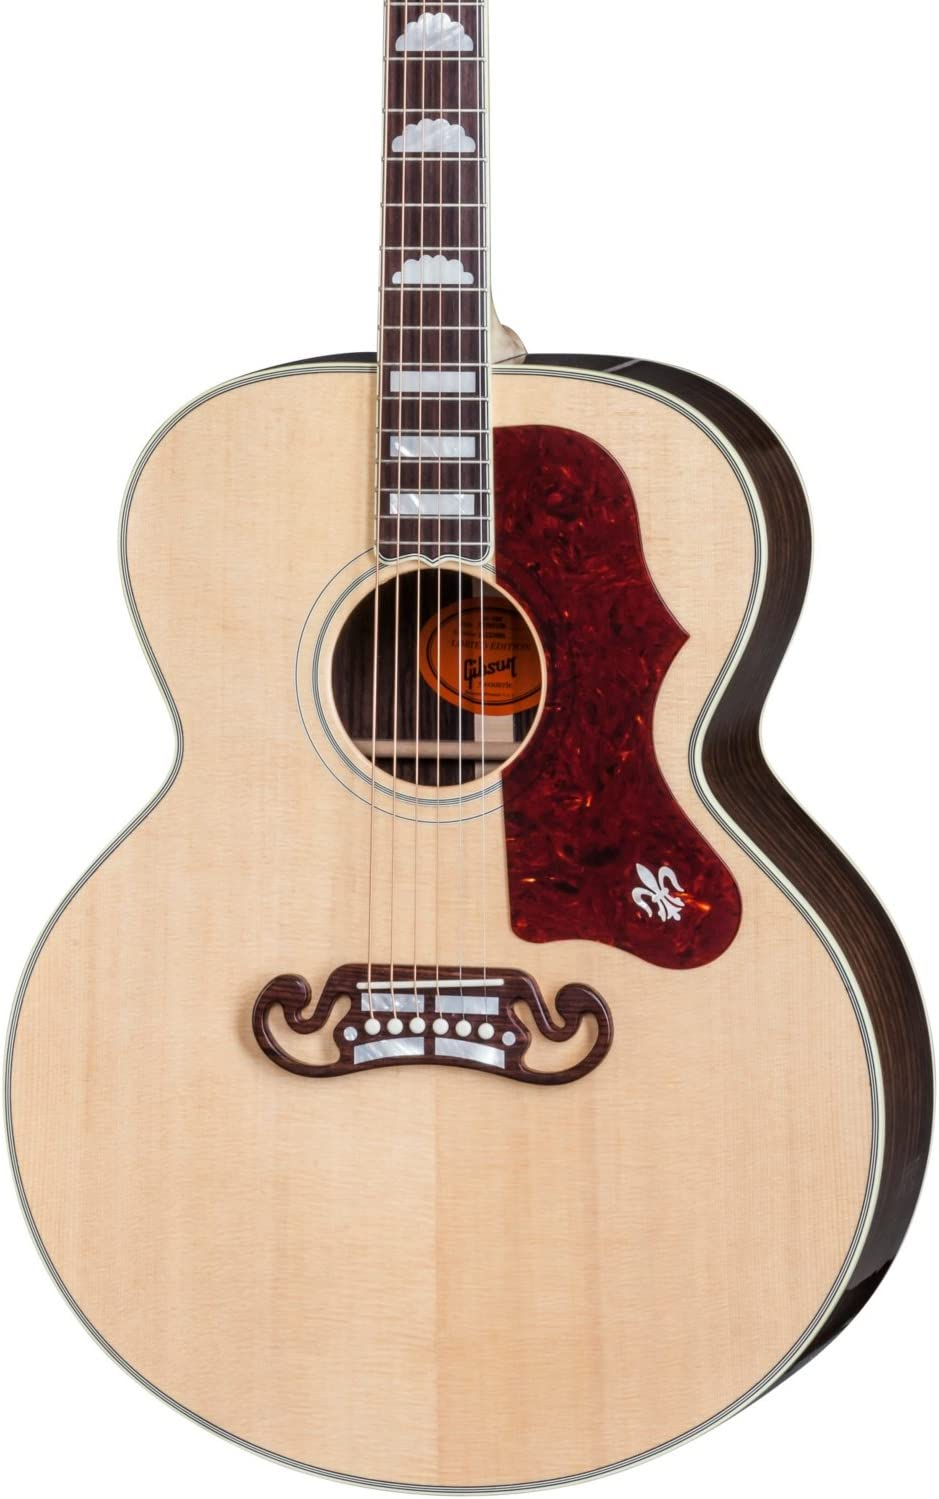 Gibson Sj-200 cita – Guitarra acústica cuerpo hueco), color ...